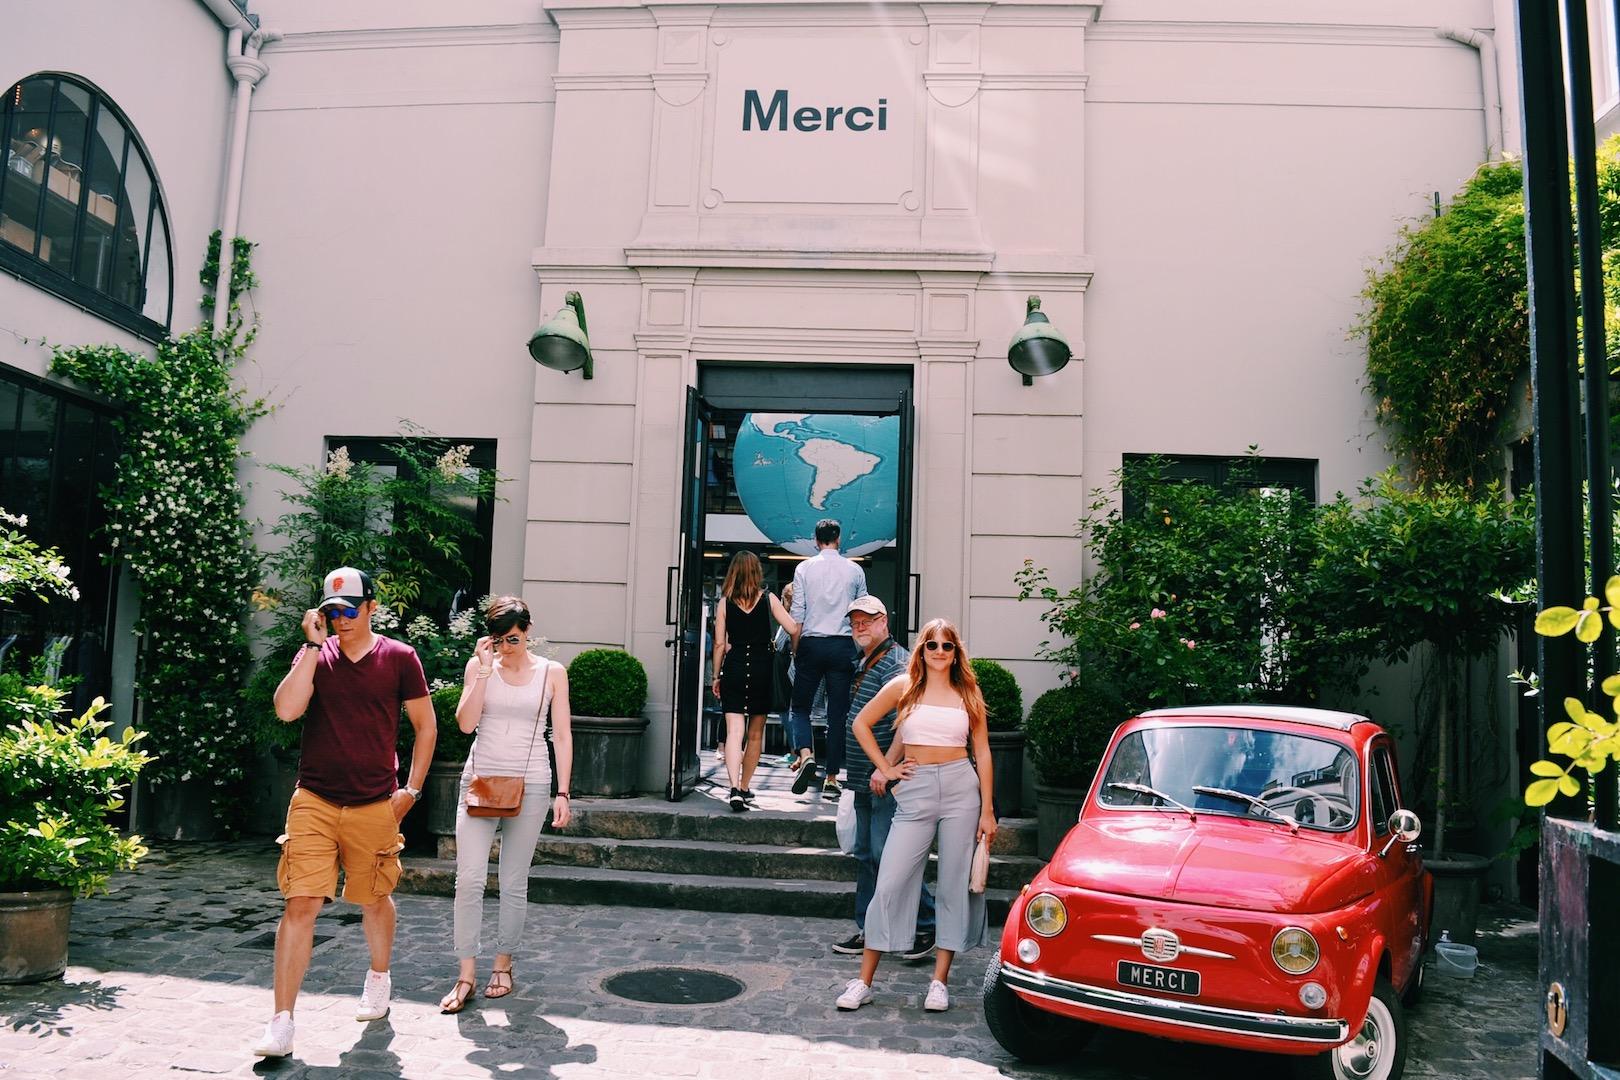 entrance-merci-paris.JPG